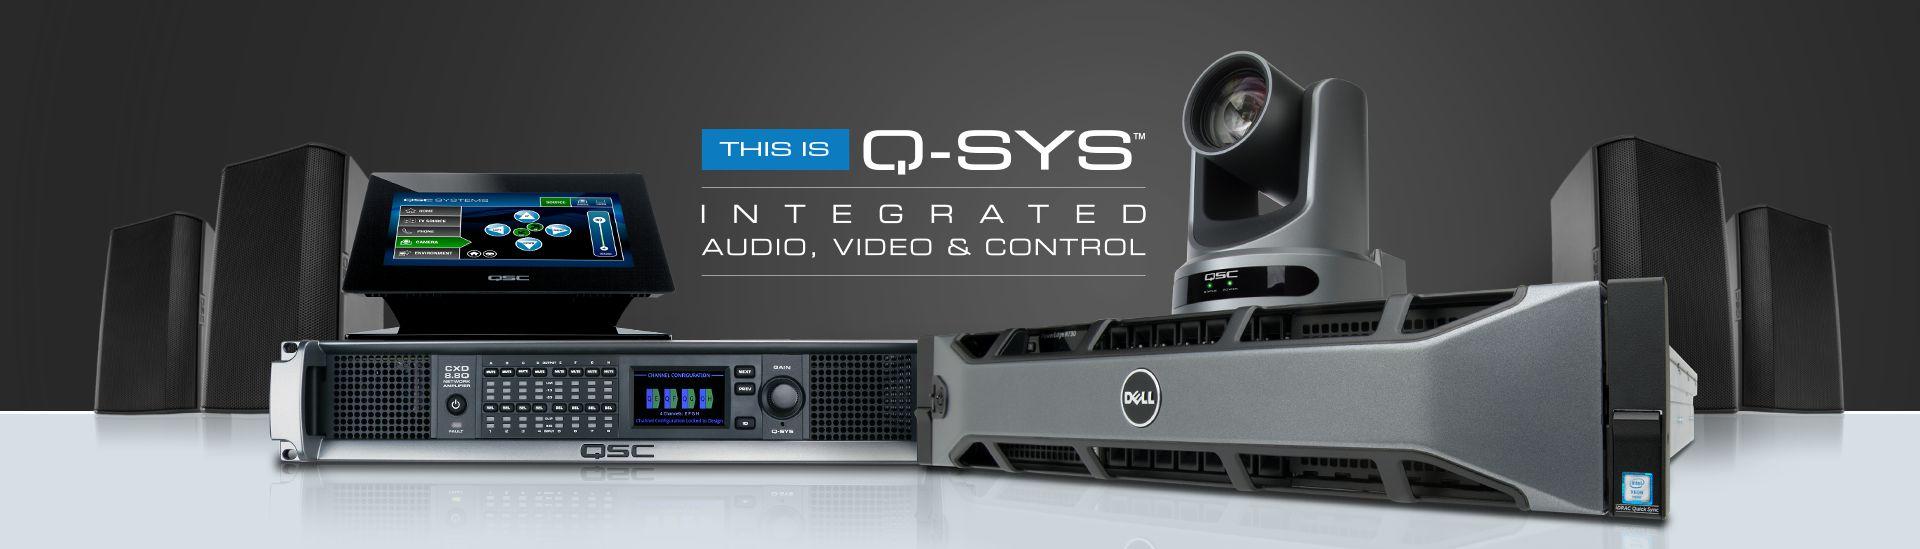 QSC Q-SYS Platform | Integrated Audio, Video & Control